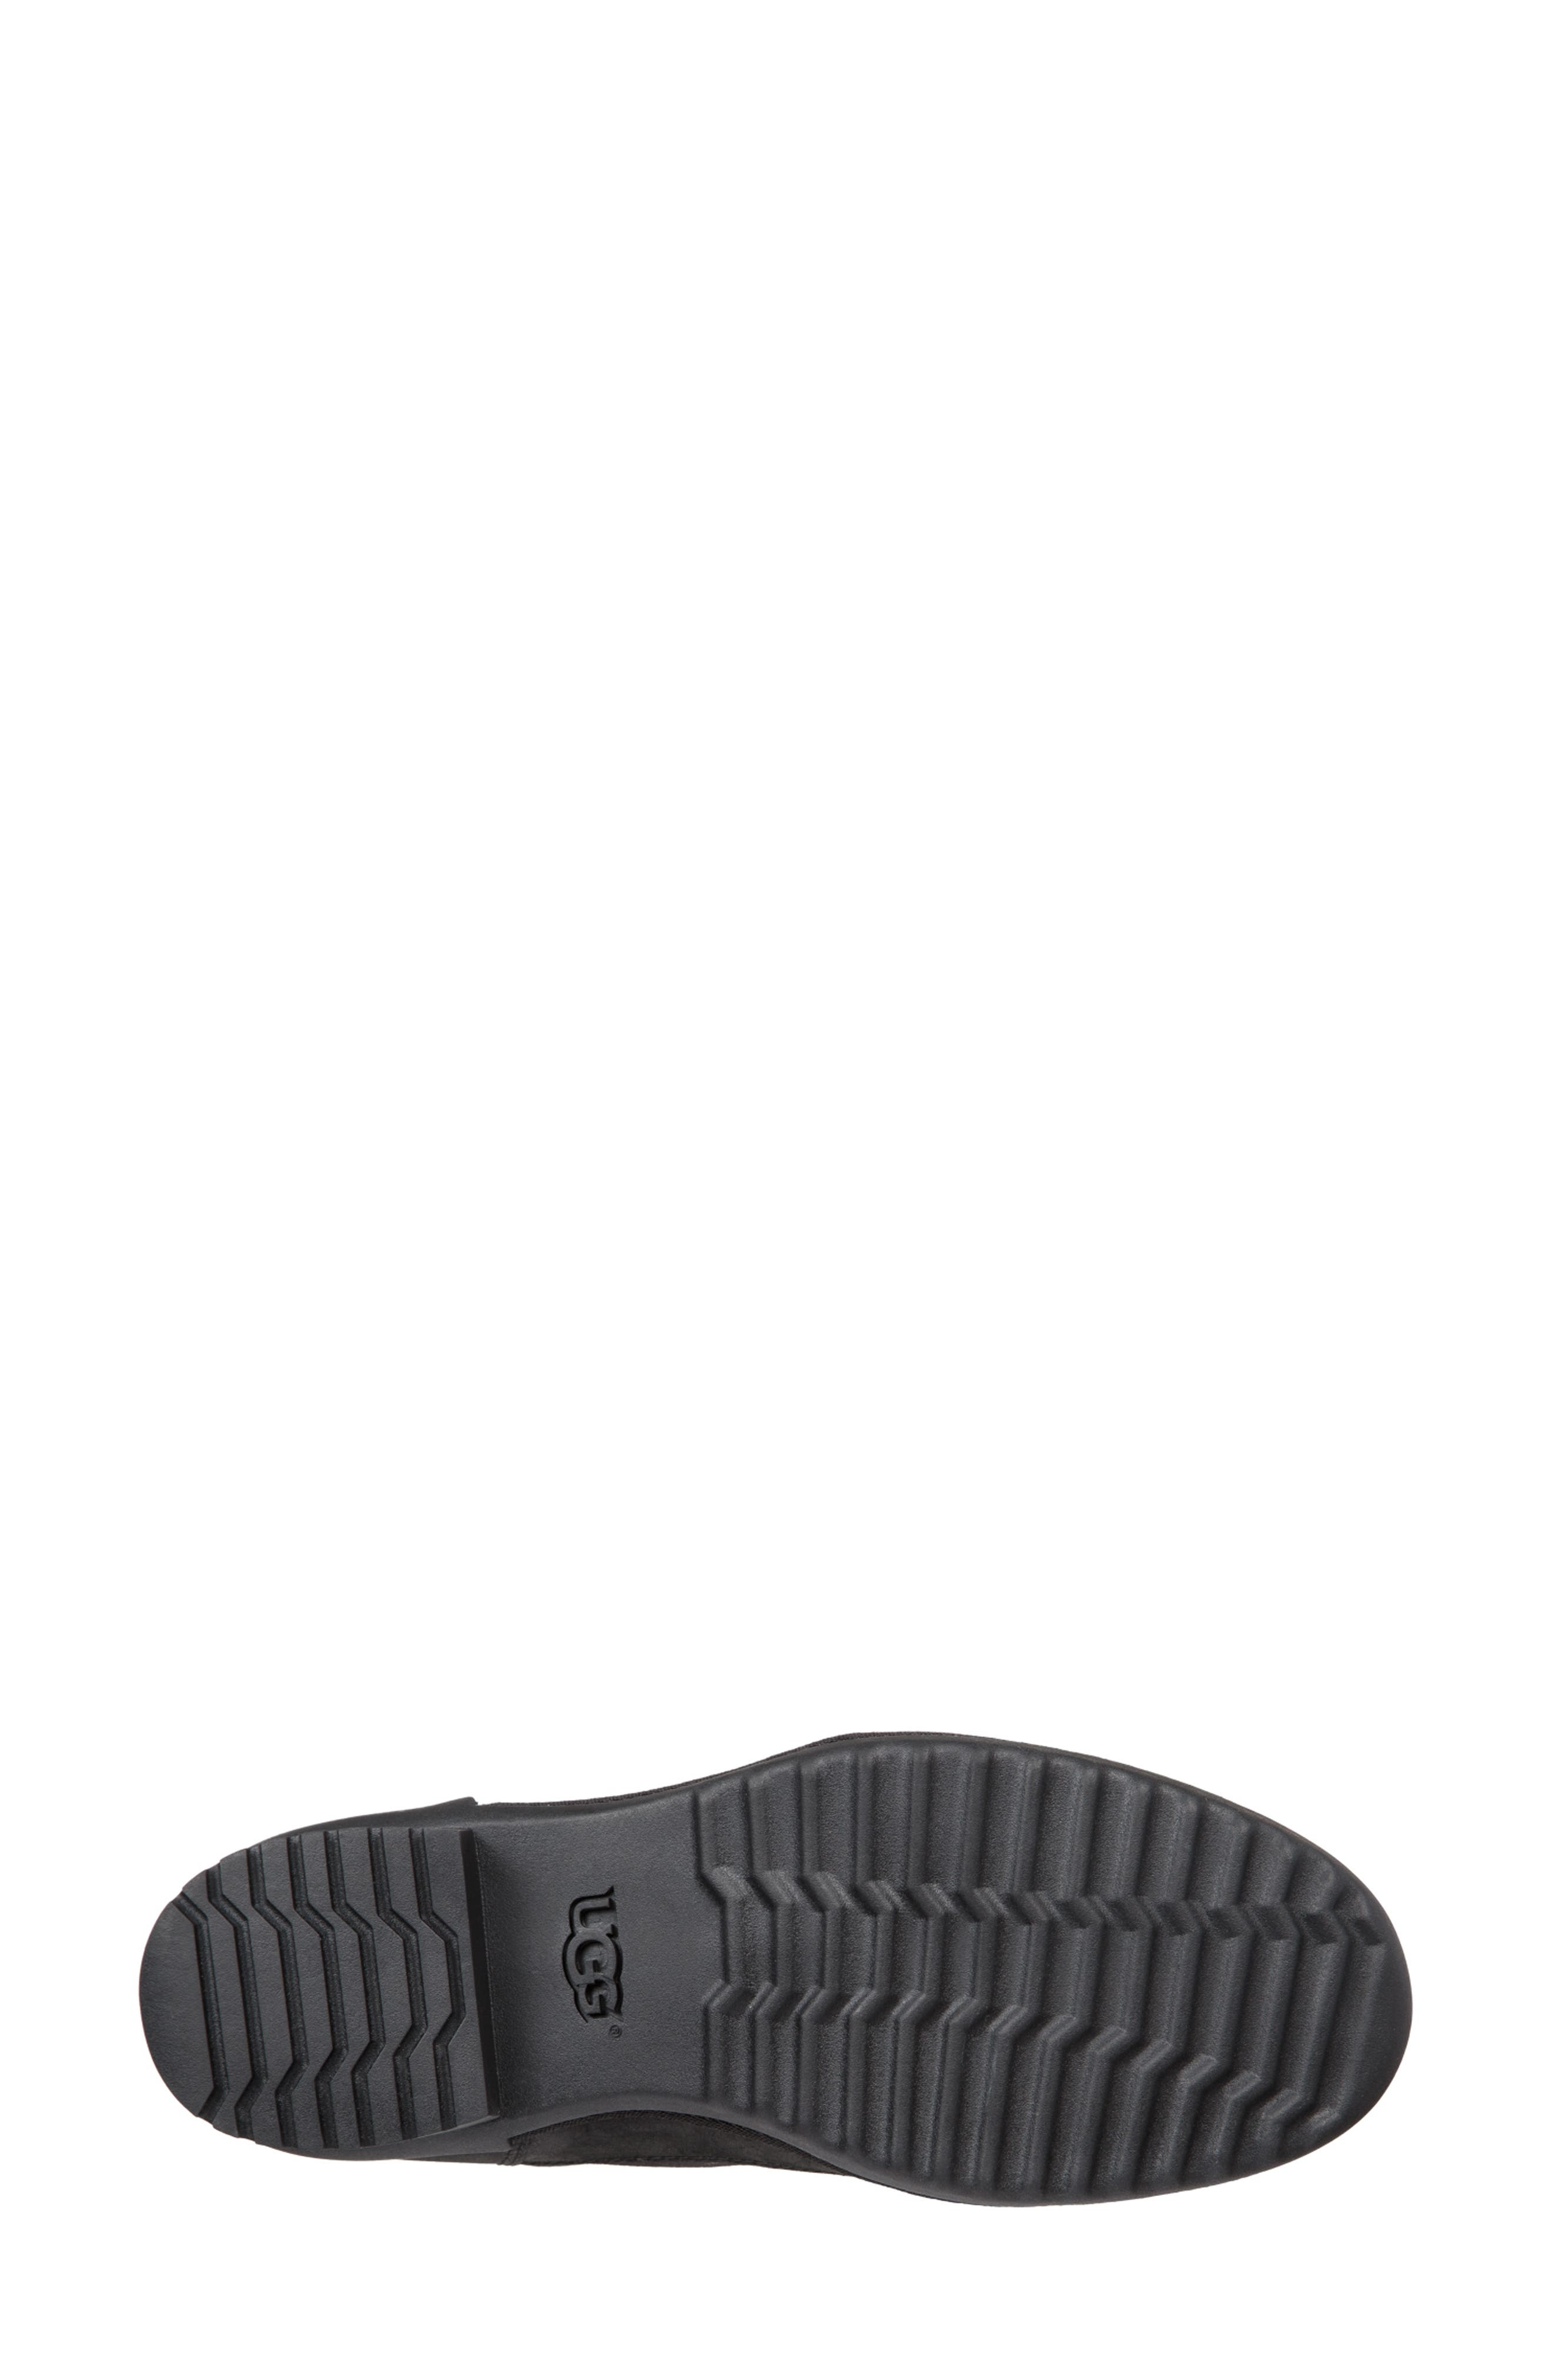 Tulane Waterproof Boot,                             Alternate thumbnail 5, color,                             BLACK LEATHER